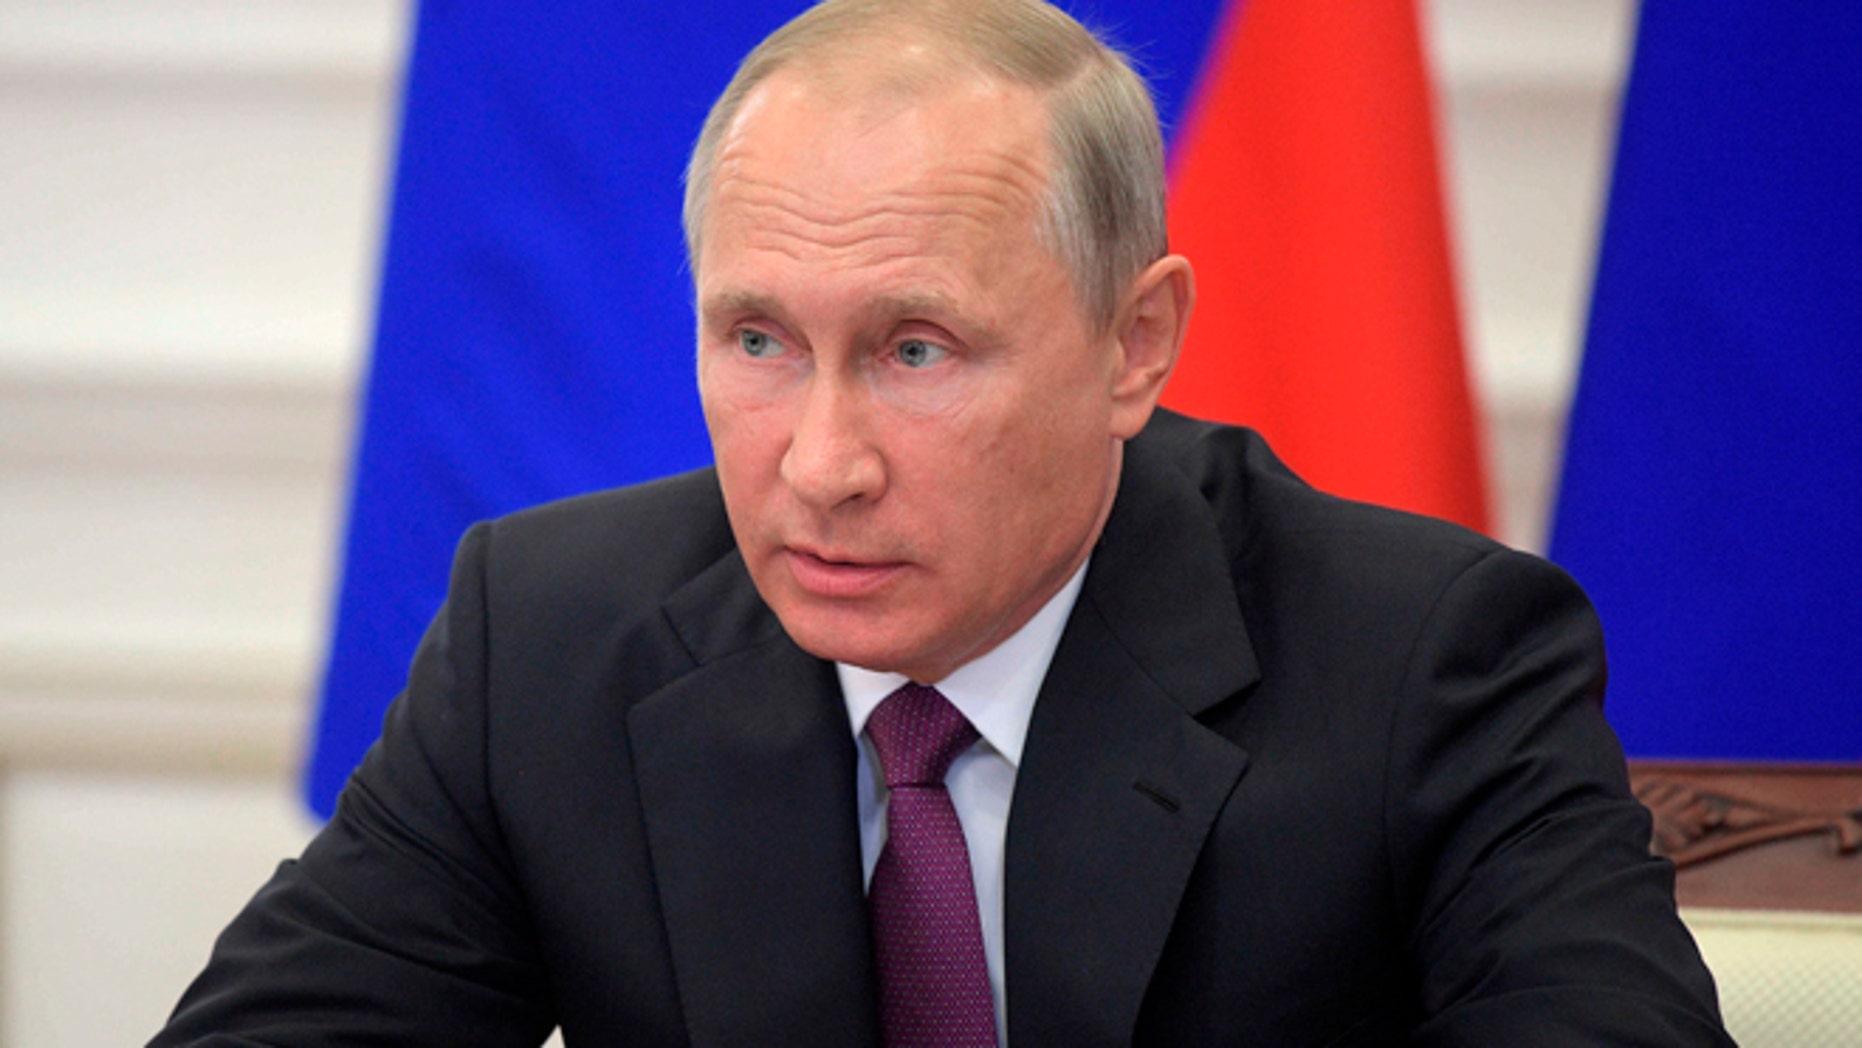 Russian President Vladimir Putin chairs a meeting on the development of transport infrastructure in Kaliningrad, Russia, Wednesday, Aug. 16, 2017. (Alexei Druzhinin, Sputnik/Kremlin Pool Photo via AP)